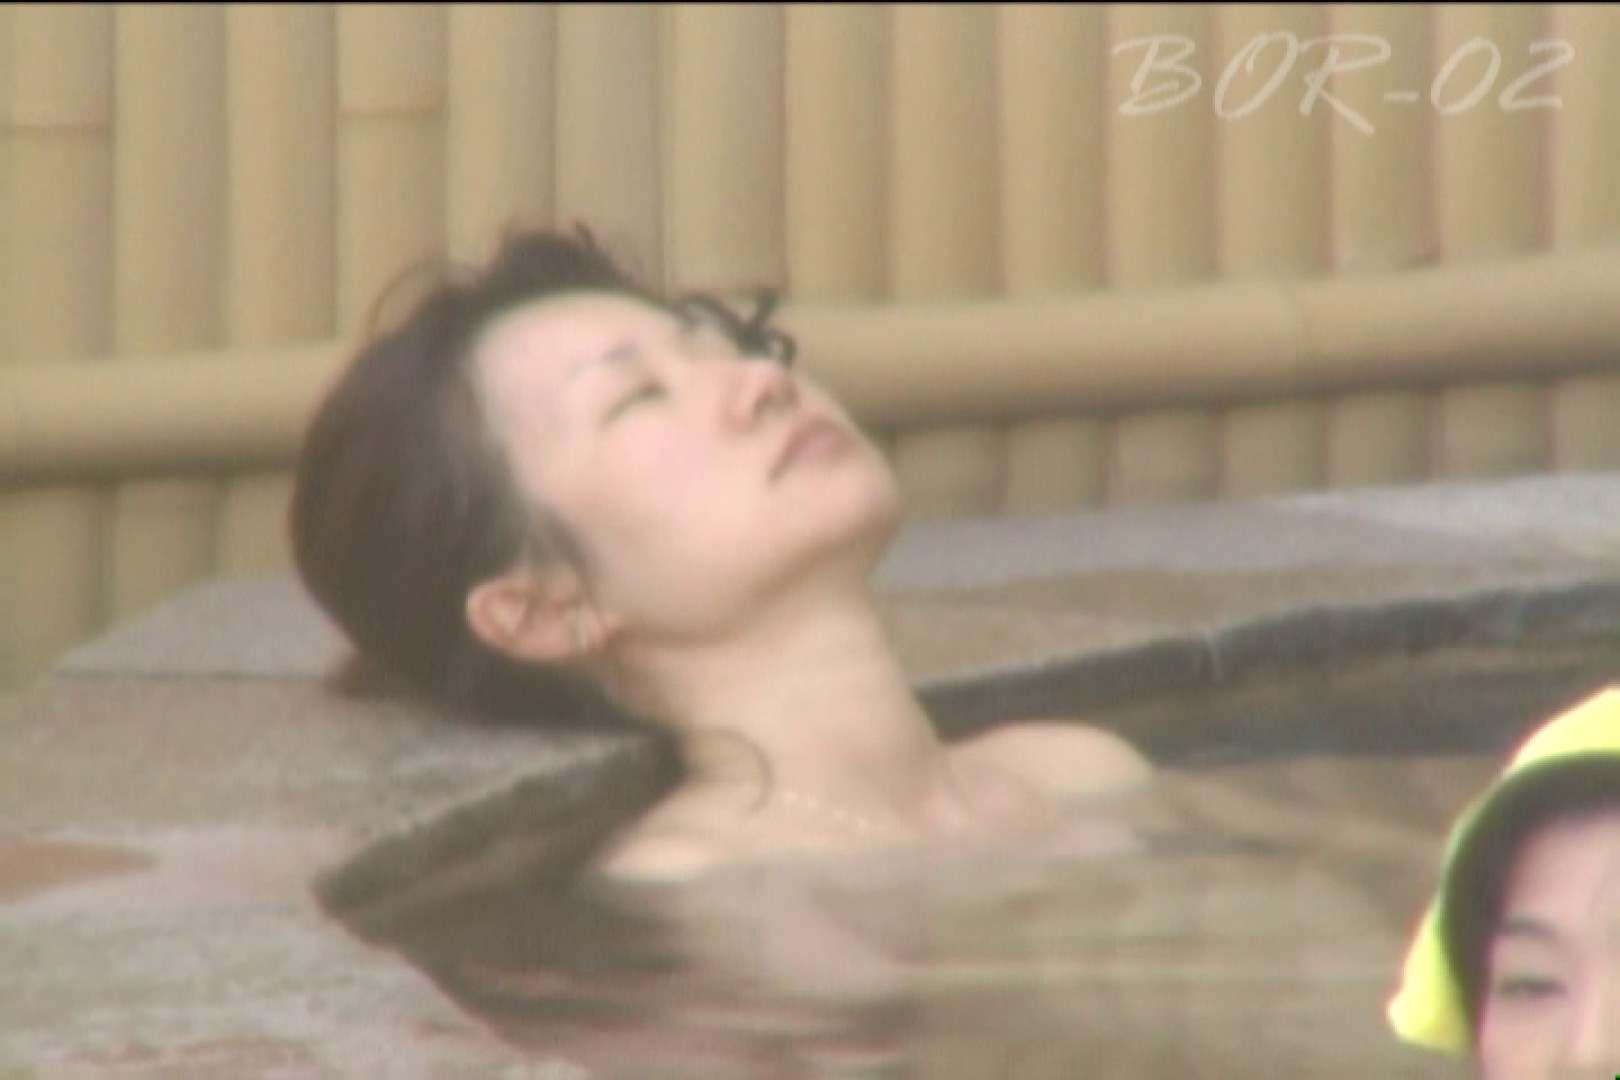 Aquaな露天風呂Vol.477 盗撮   OLエロ画像  99PICs 34